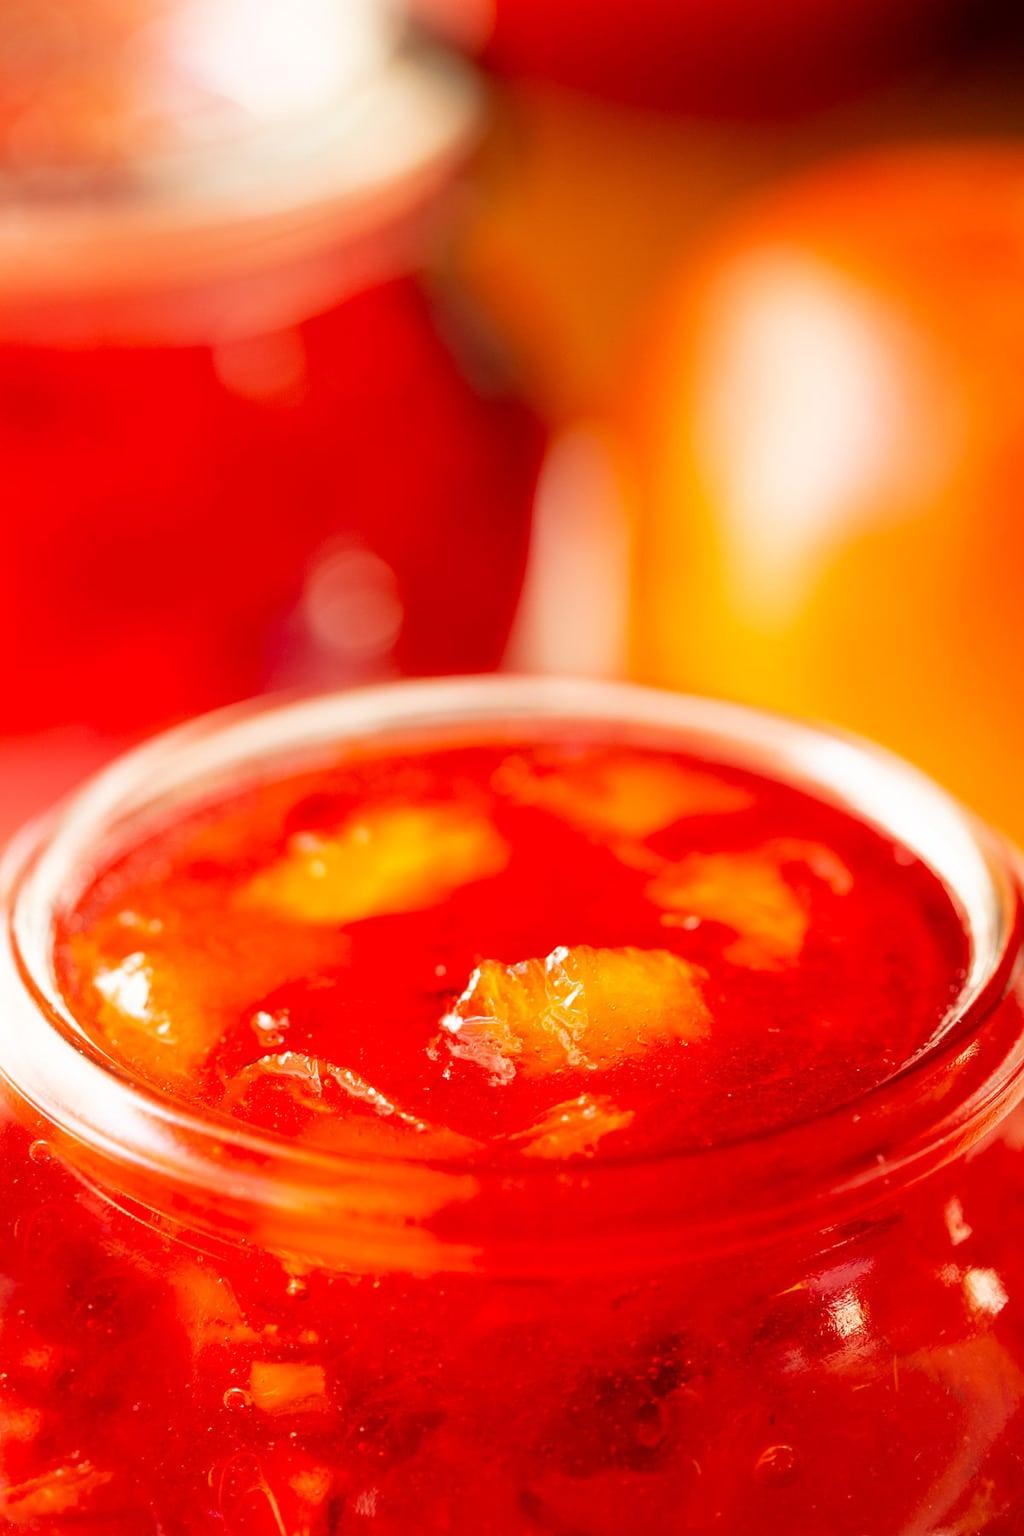 Extreme closeup photo of a Weck glass jar of Blood Orange Marmalade.